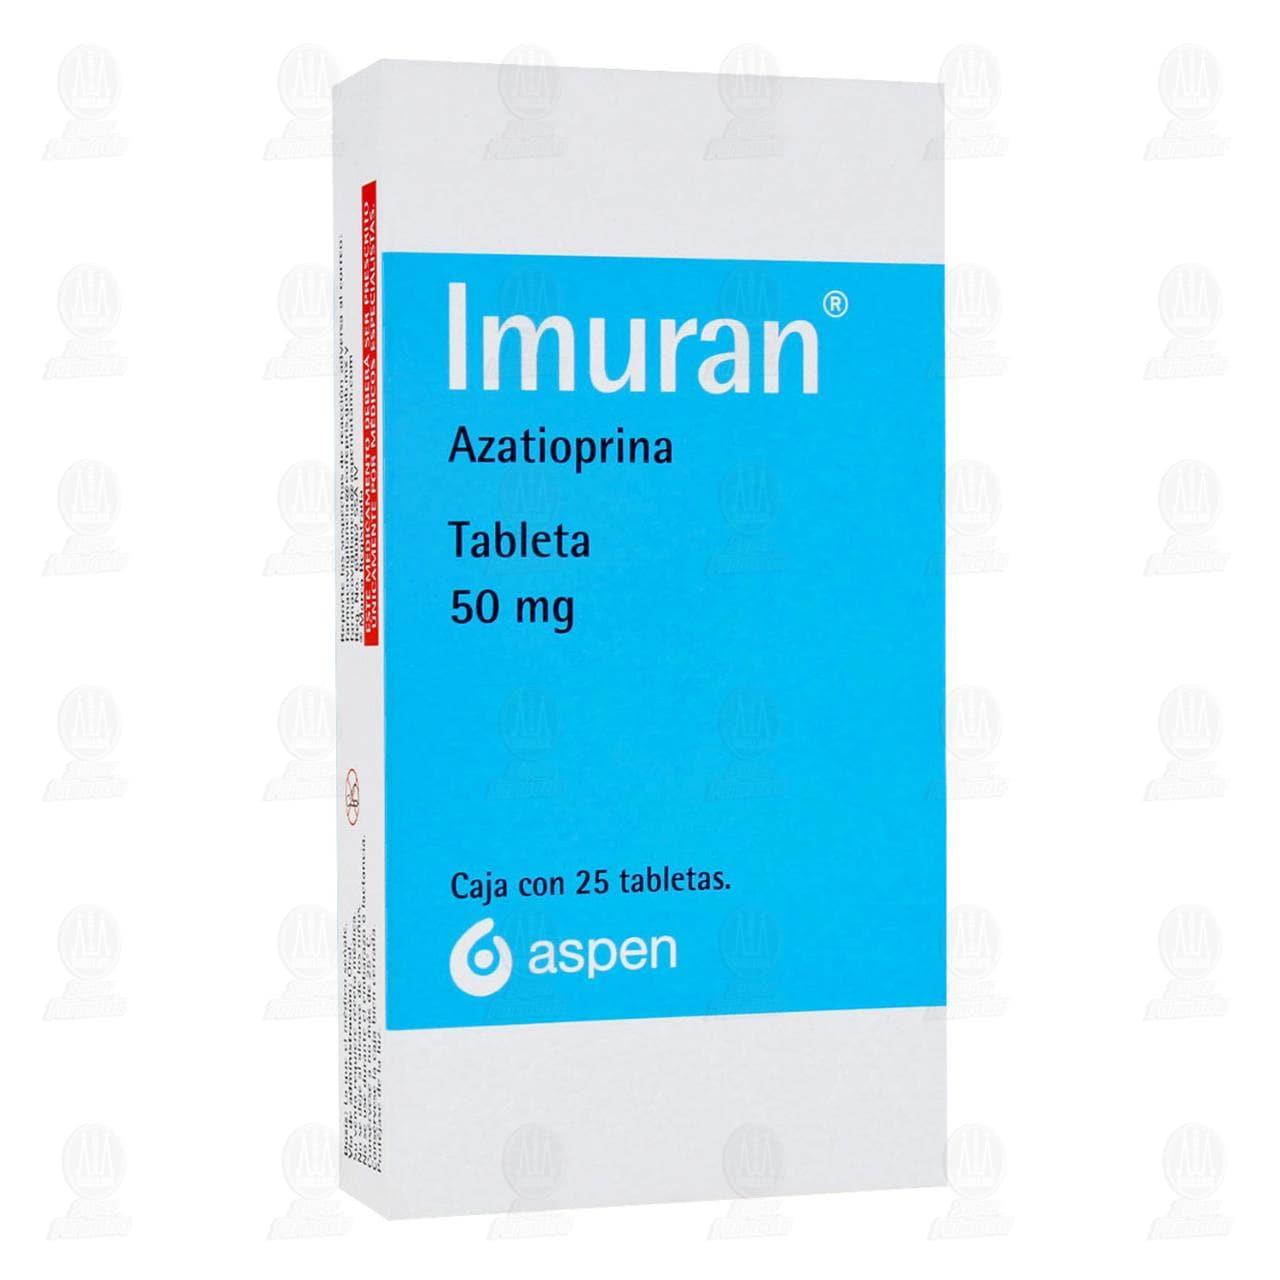 Comprar Imuran 50mg 25 Tabletas en Farmacias Guadalajara